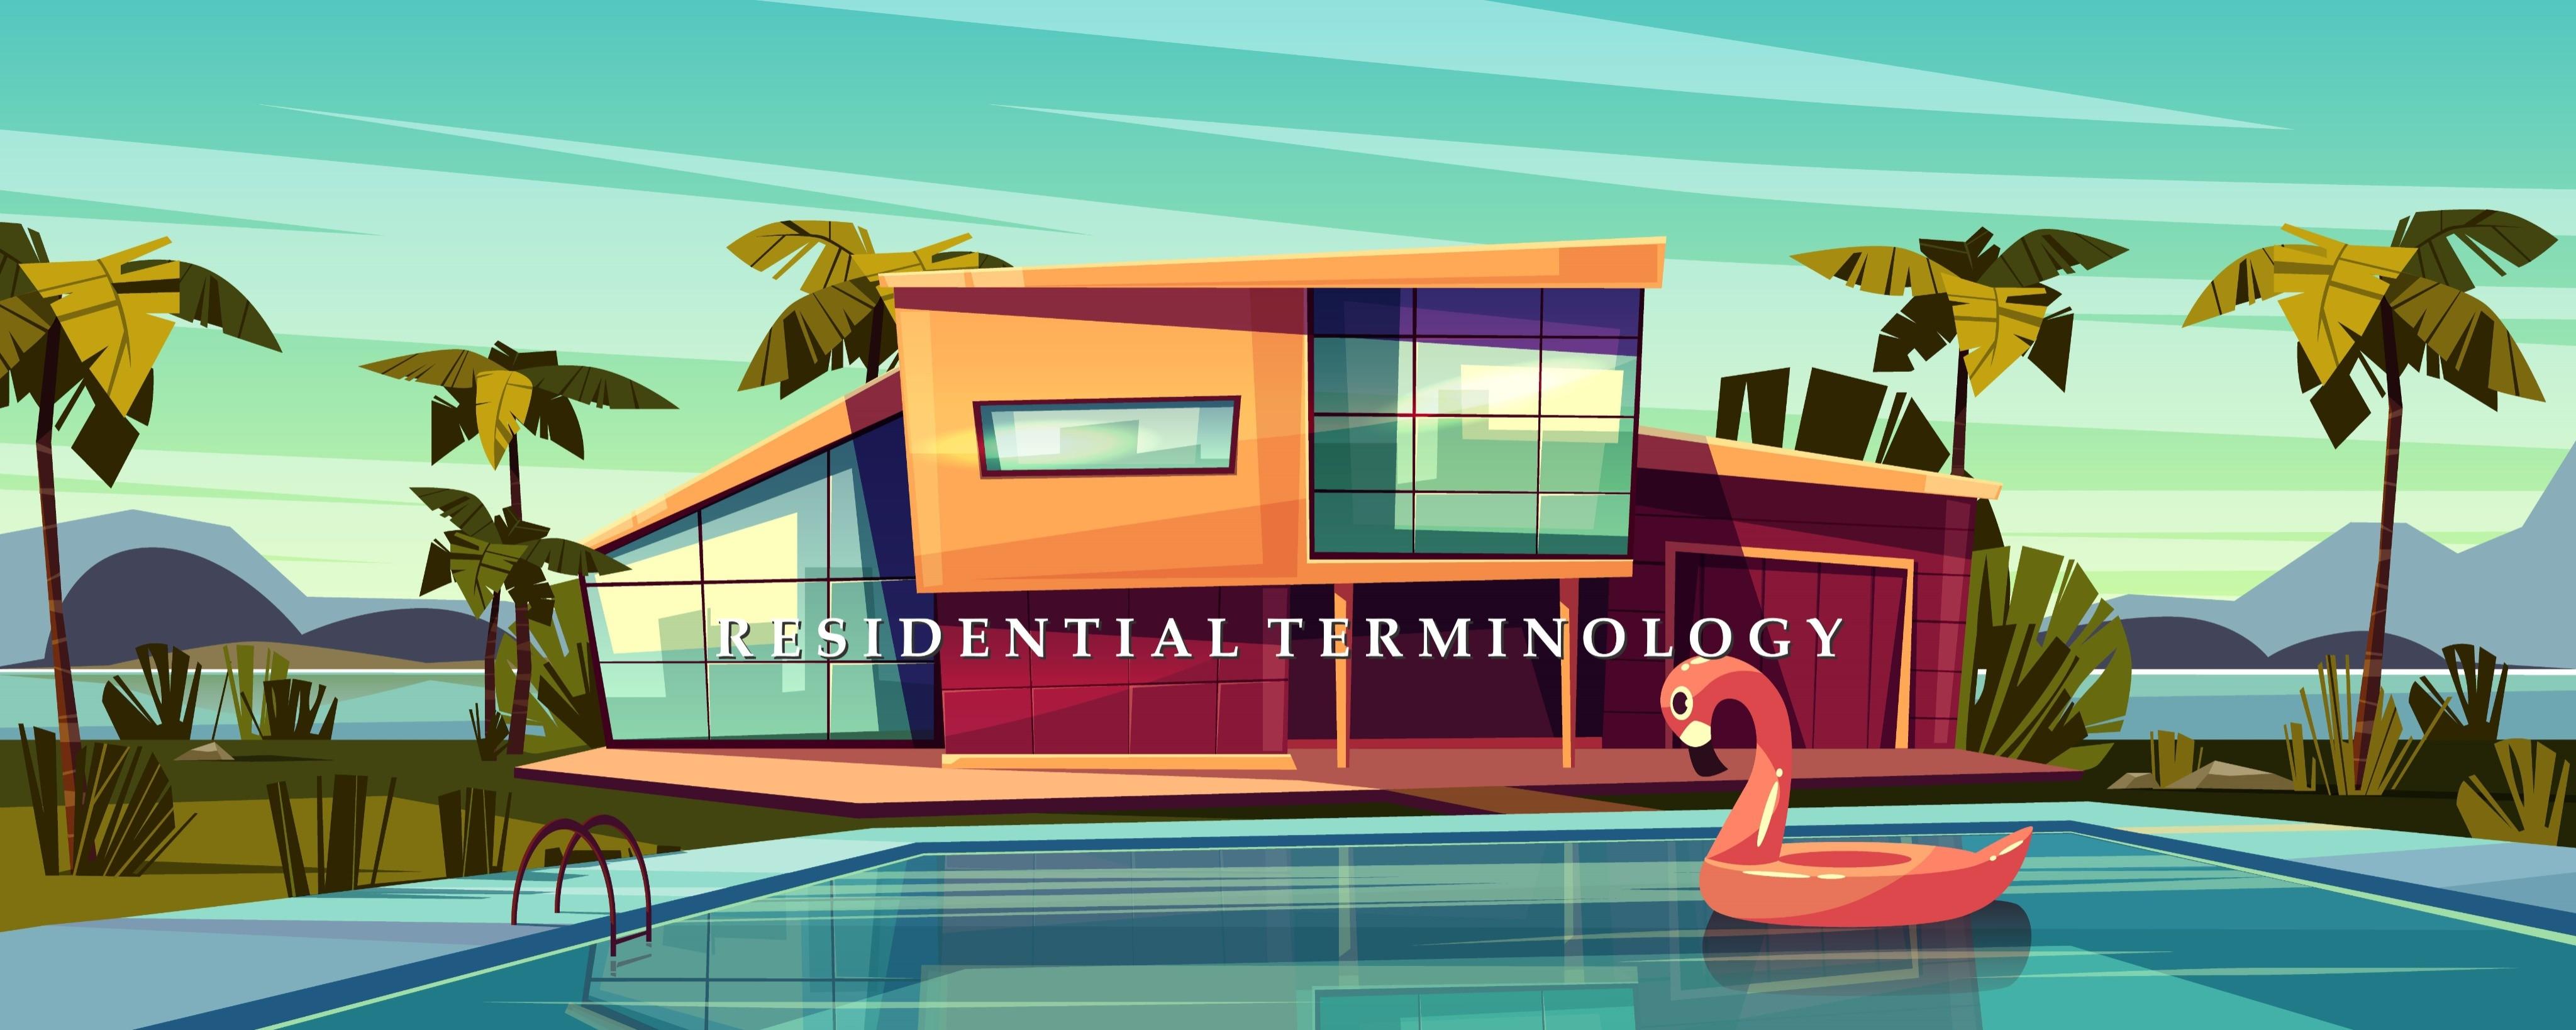 residentialterminology